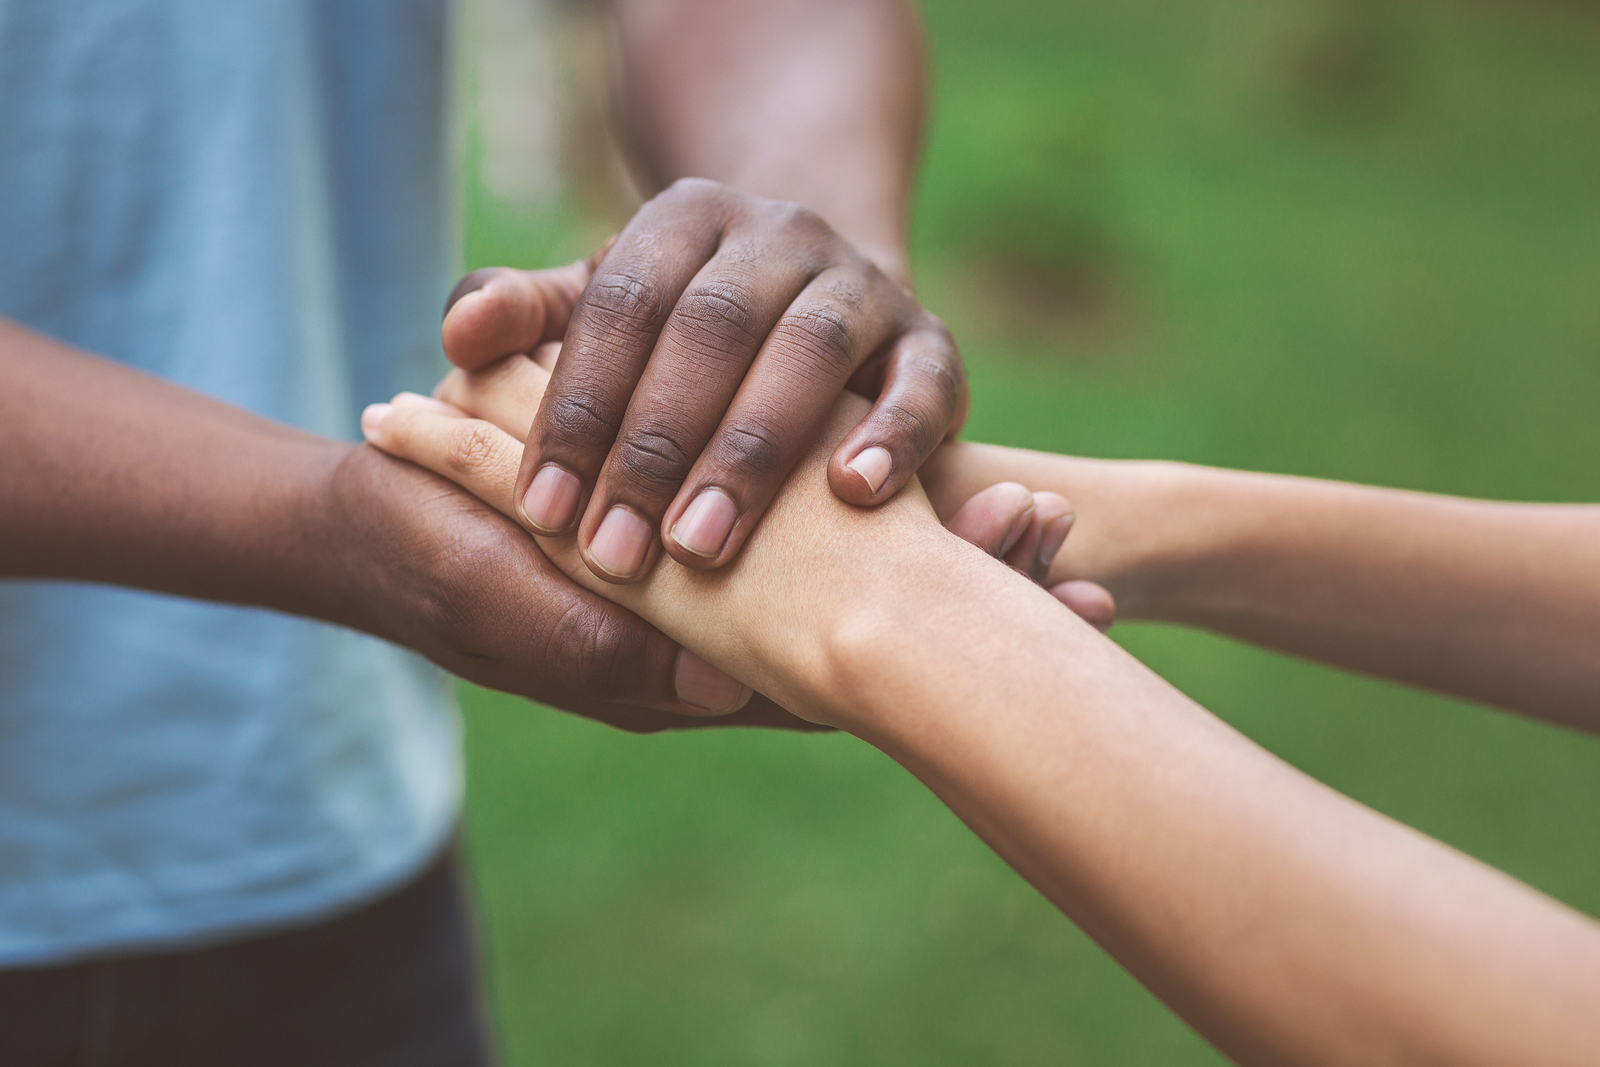 Philanthropy, Kindness, Volunteering. Black Millennial Caregiver